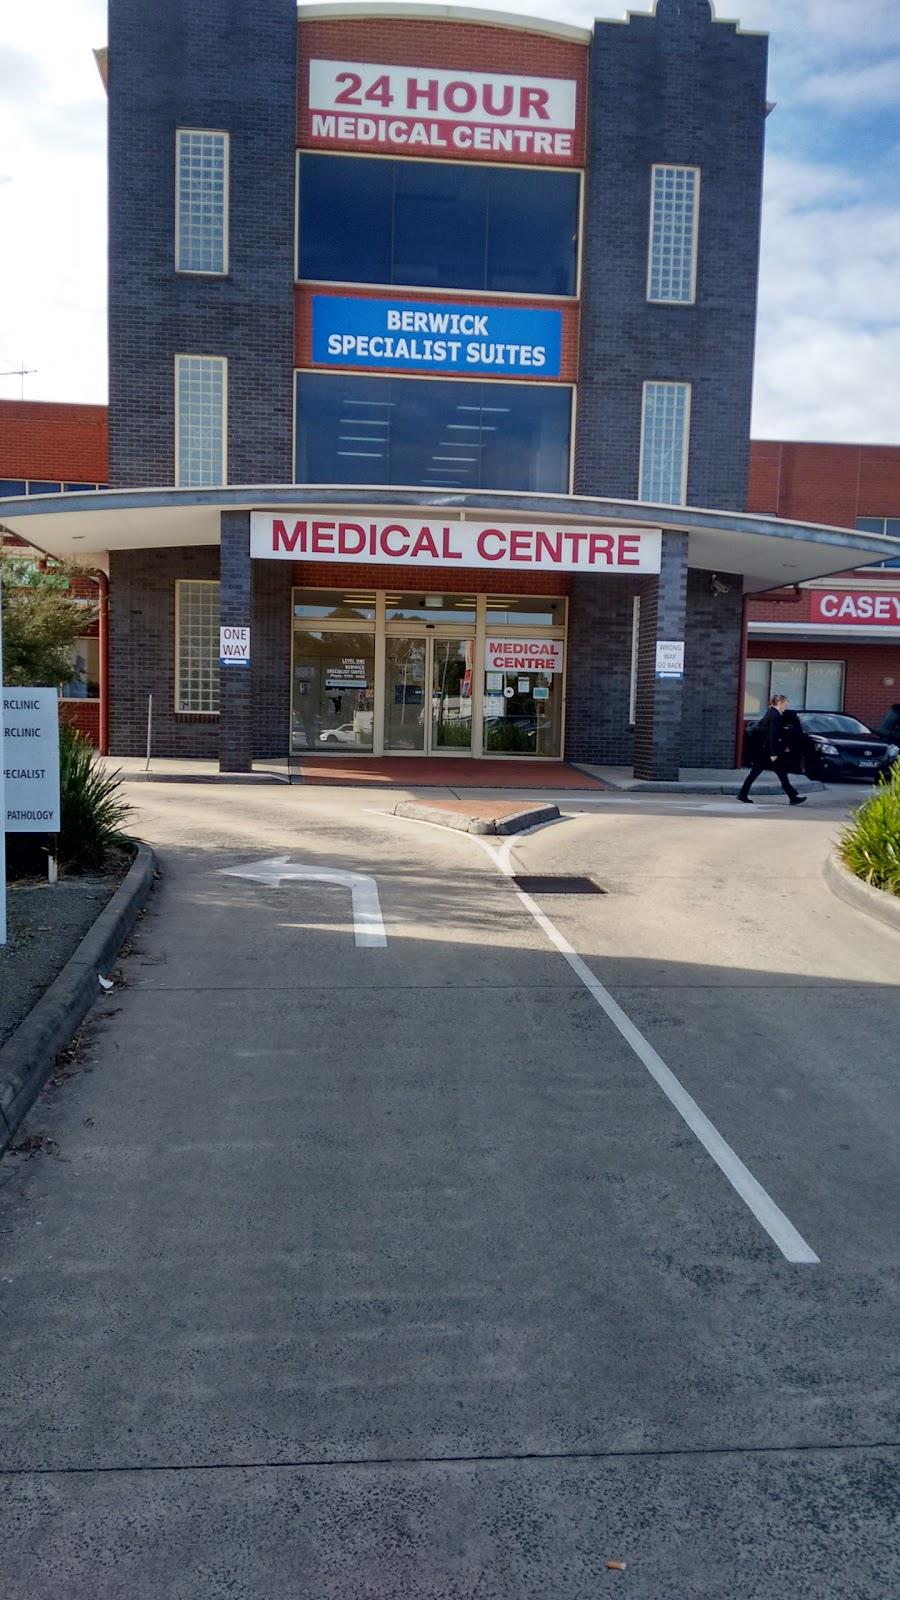 Berwick Specialist Suites | doctor | 52 Kangan Dr, Berwick VIC 3806, Australia | 0397096666 OR +61 3 9709 6666